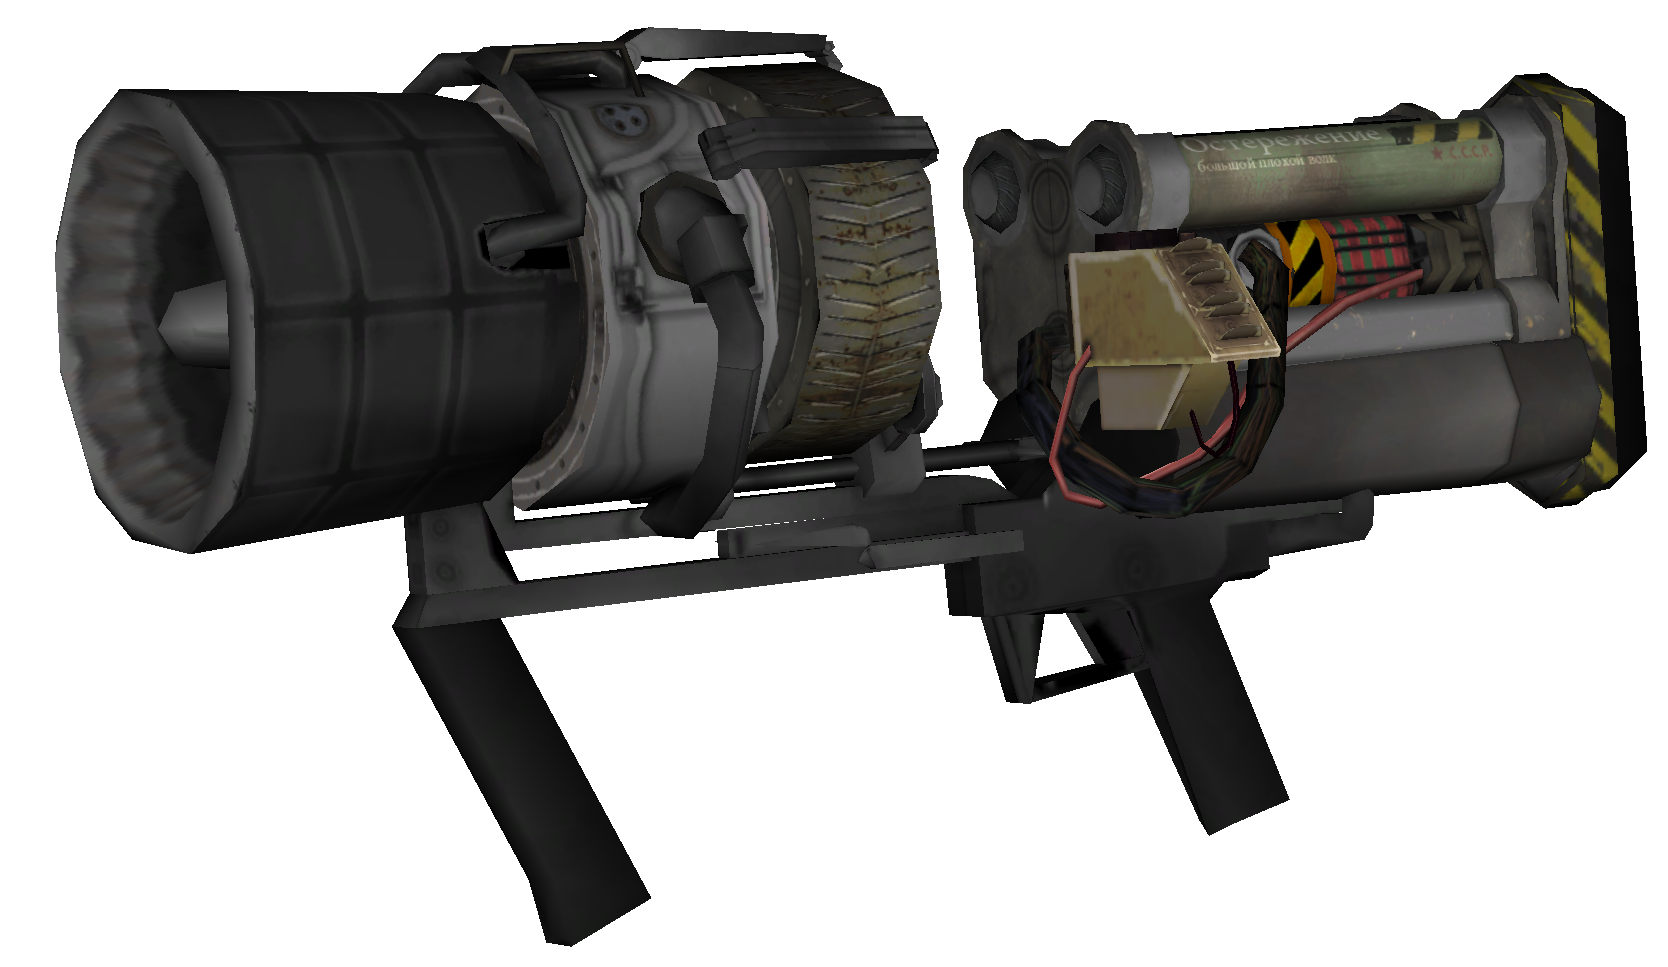 Ray Gun Mark 2 Pack A Punch Thundergun